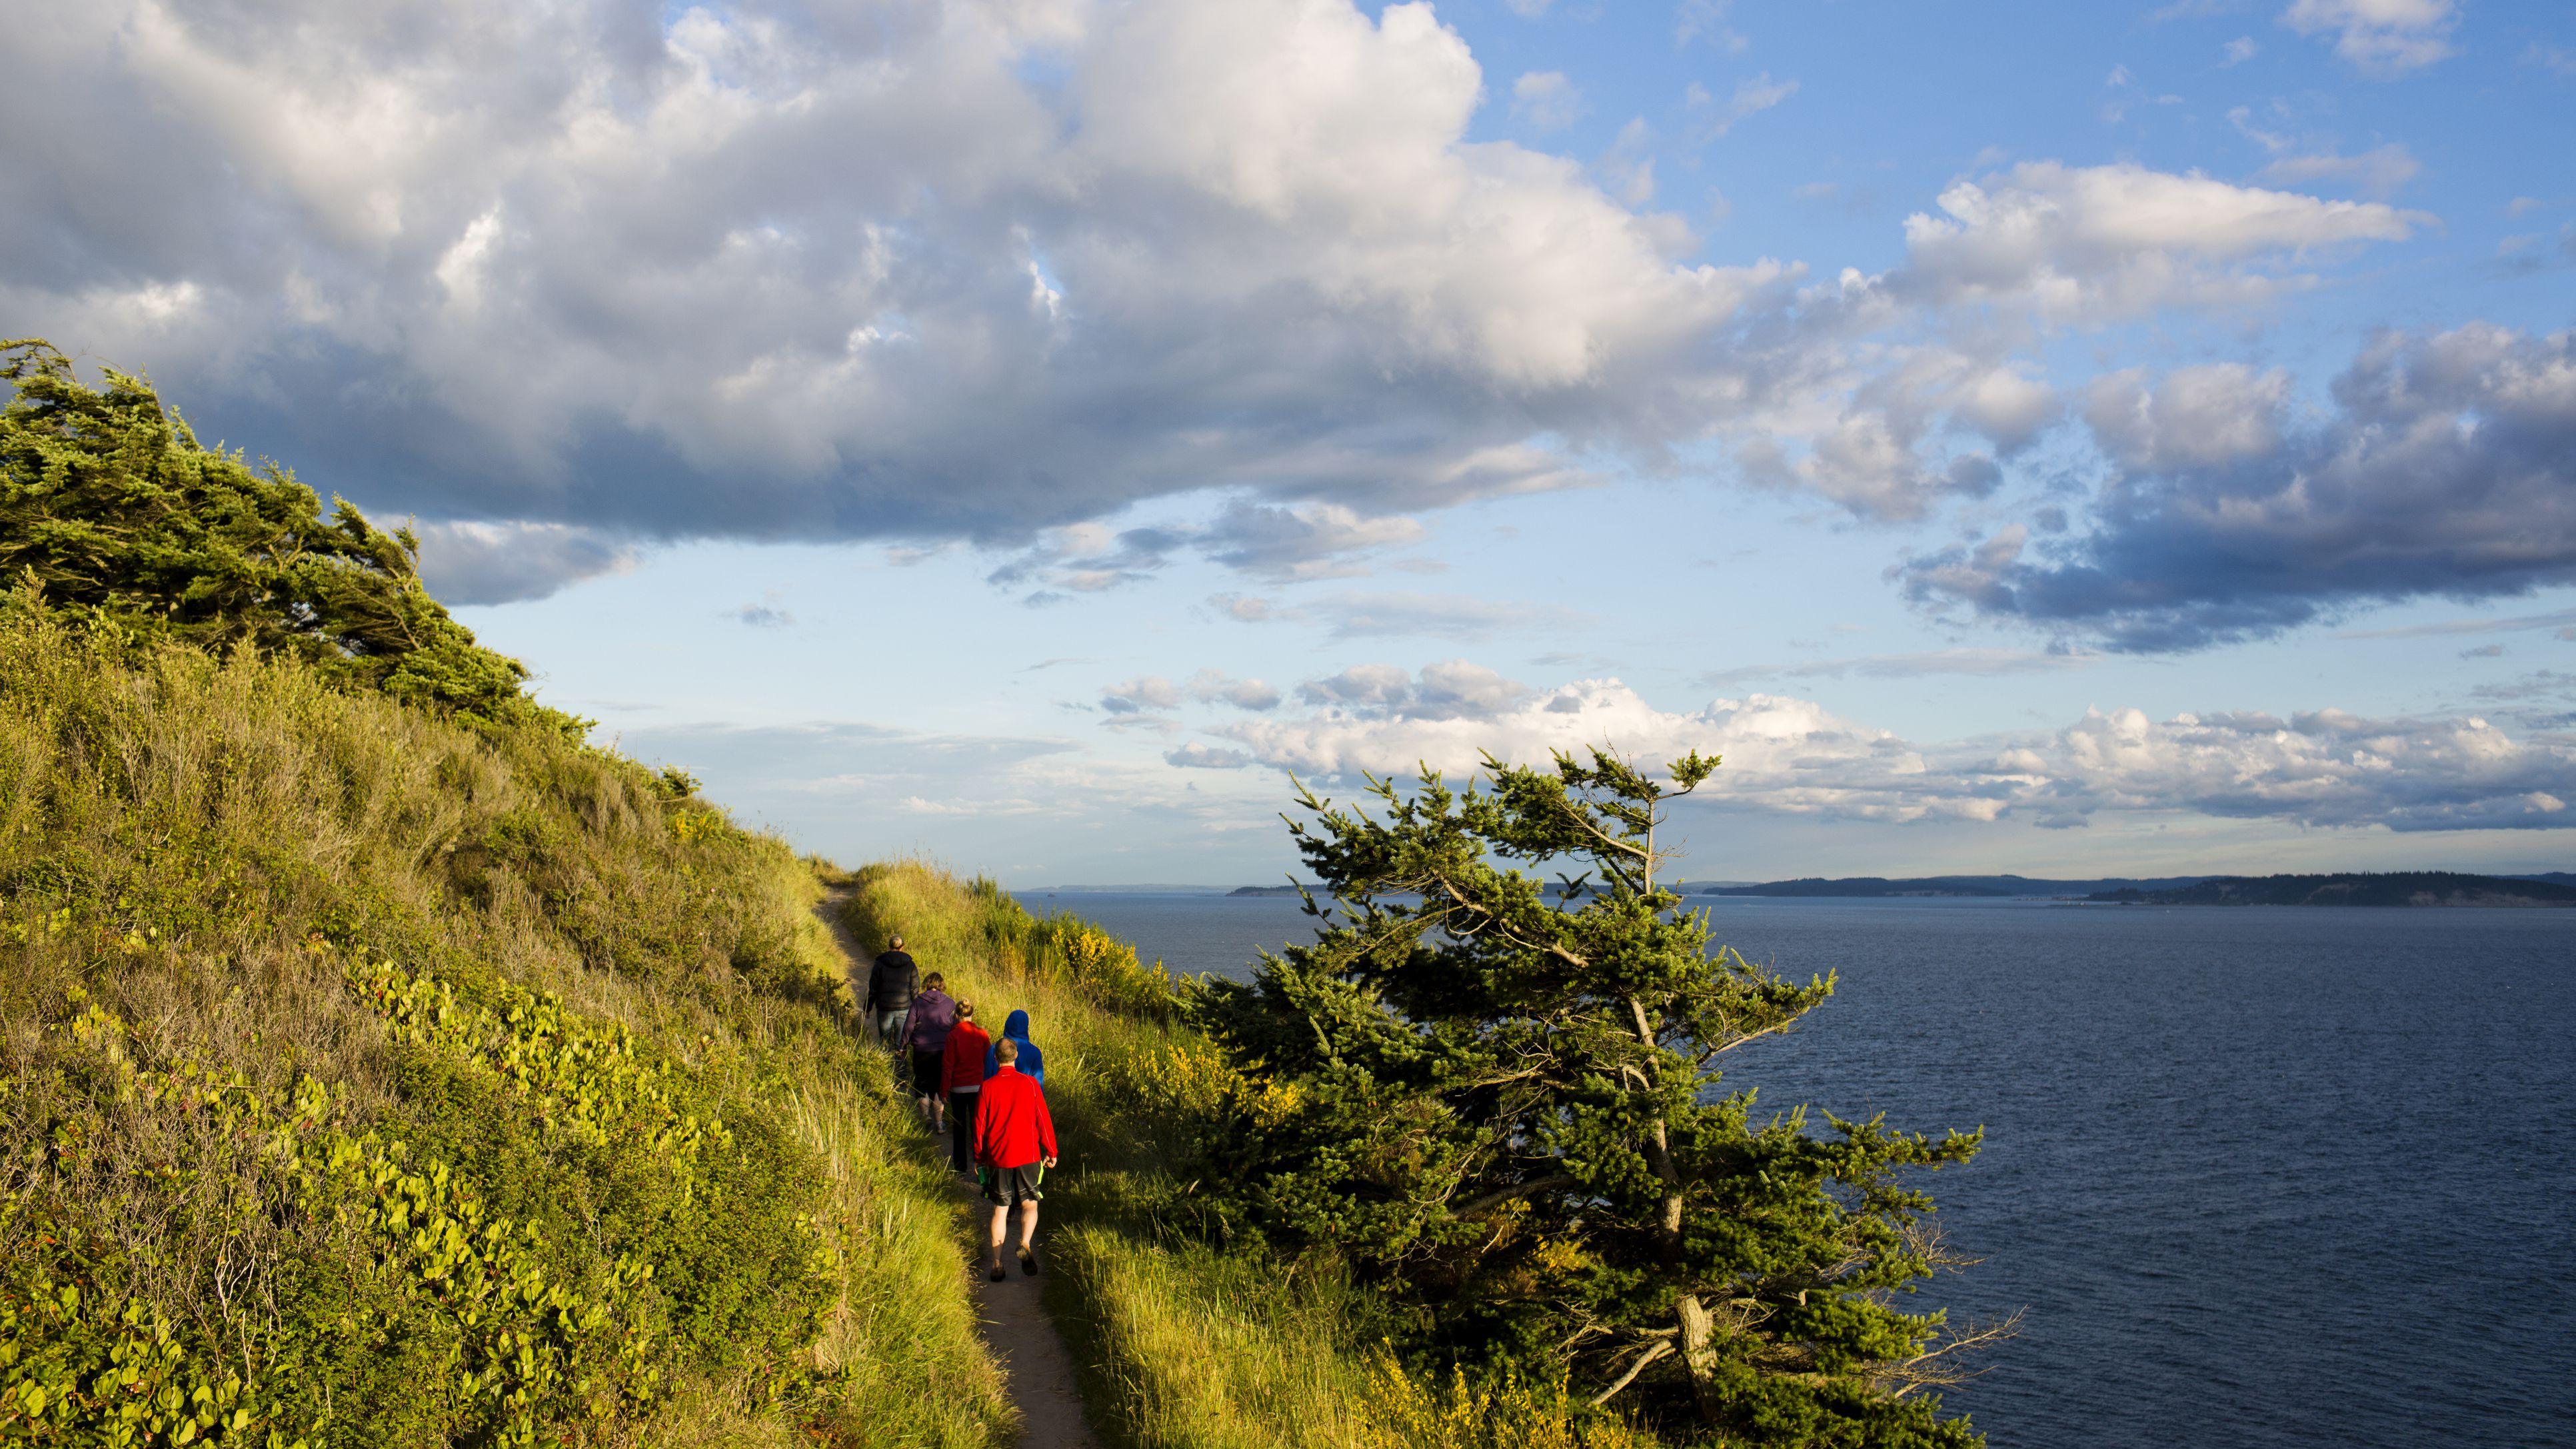 10 Fun Things to Do on Washington's Whidbey Island